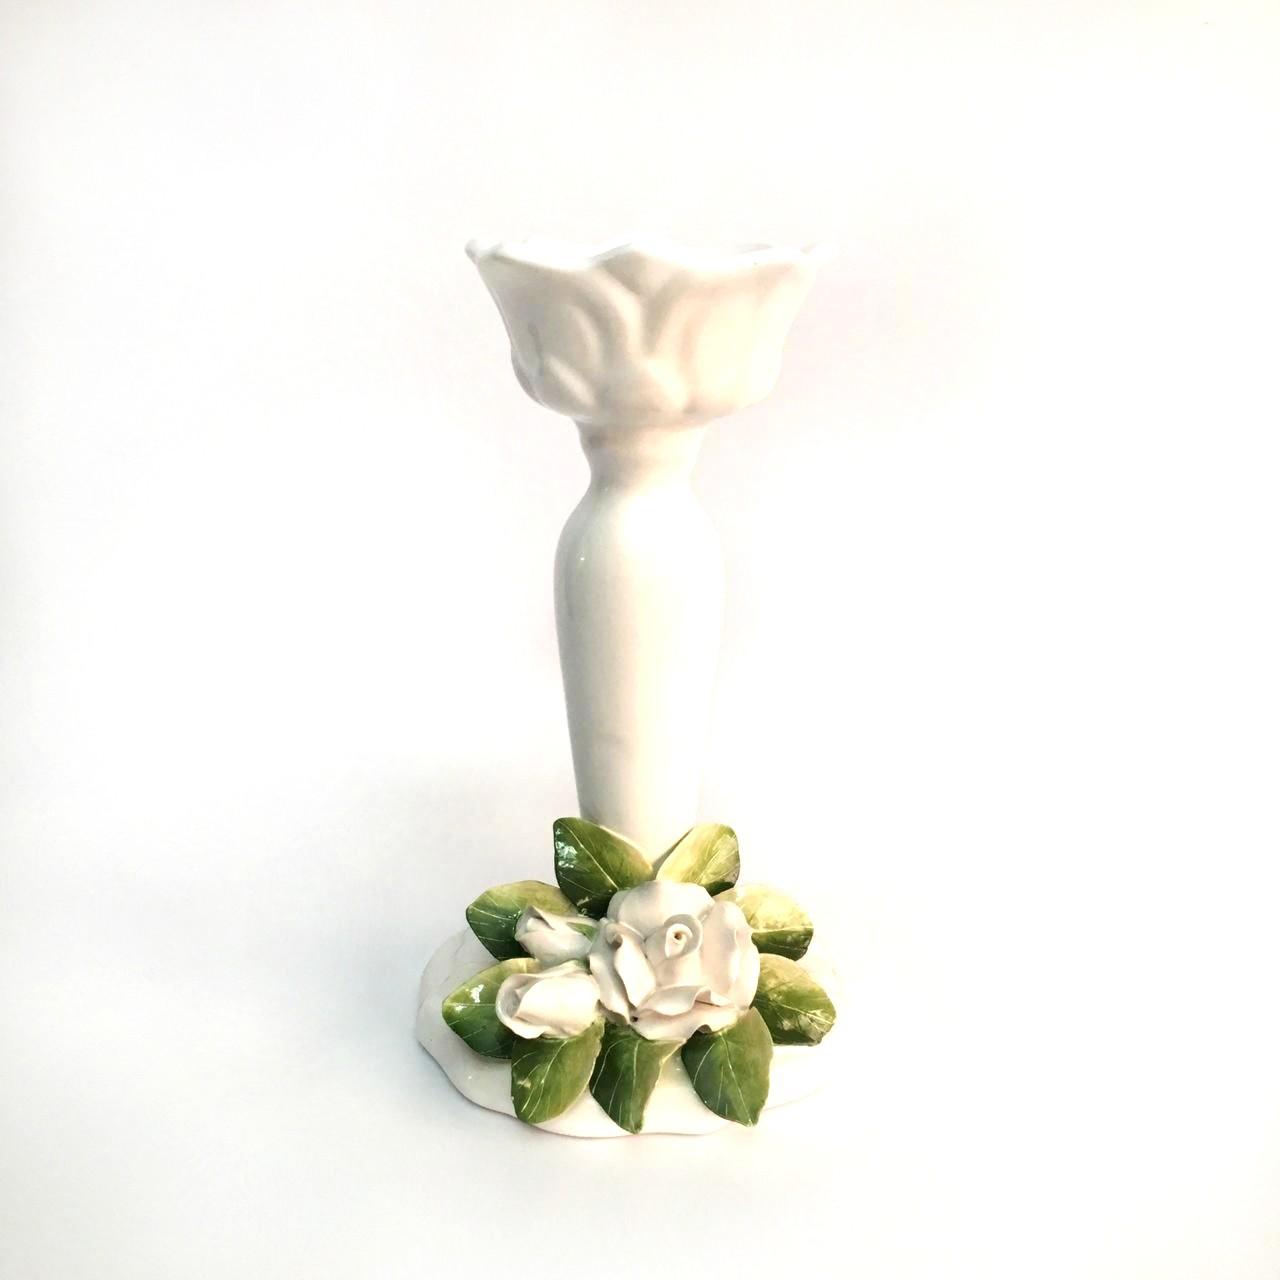 Castical de rosas brancas M 27x16